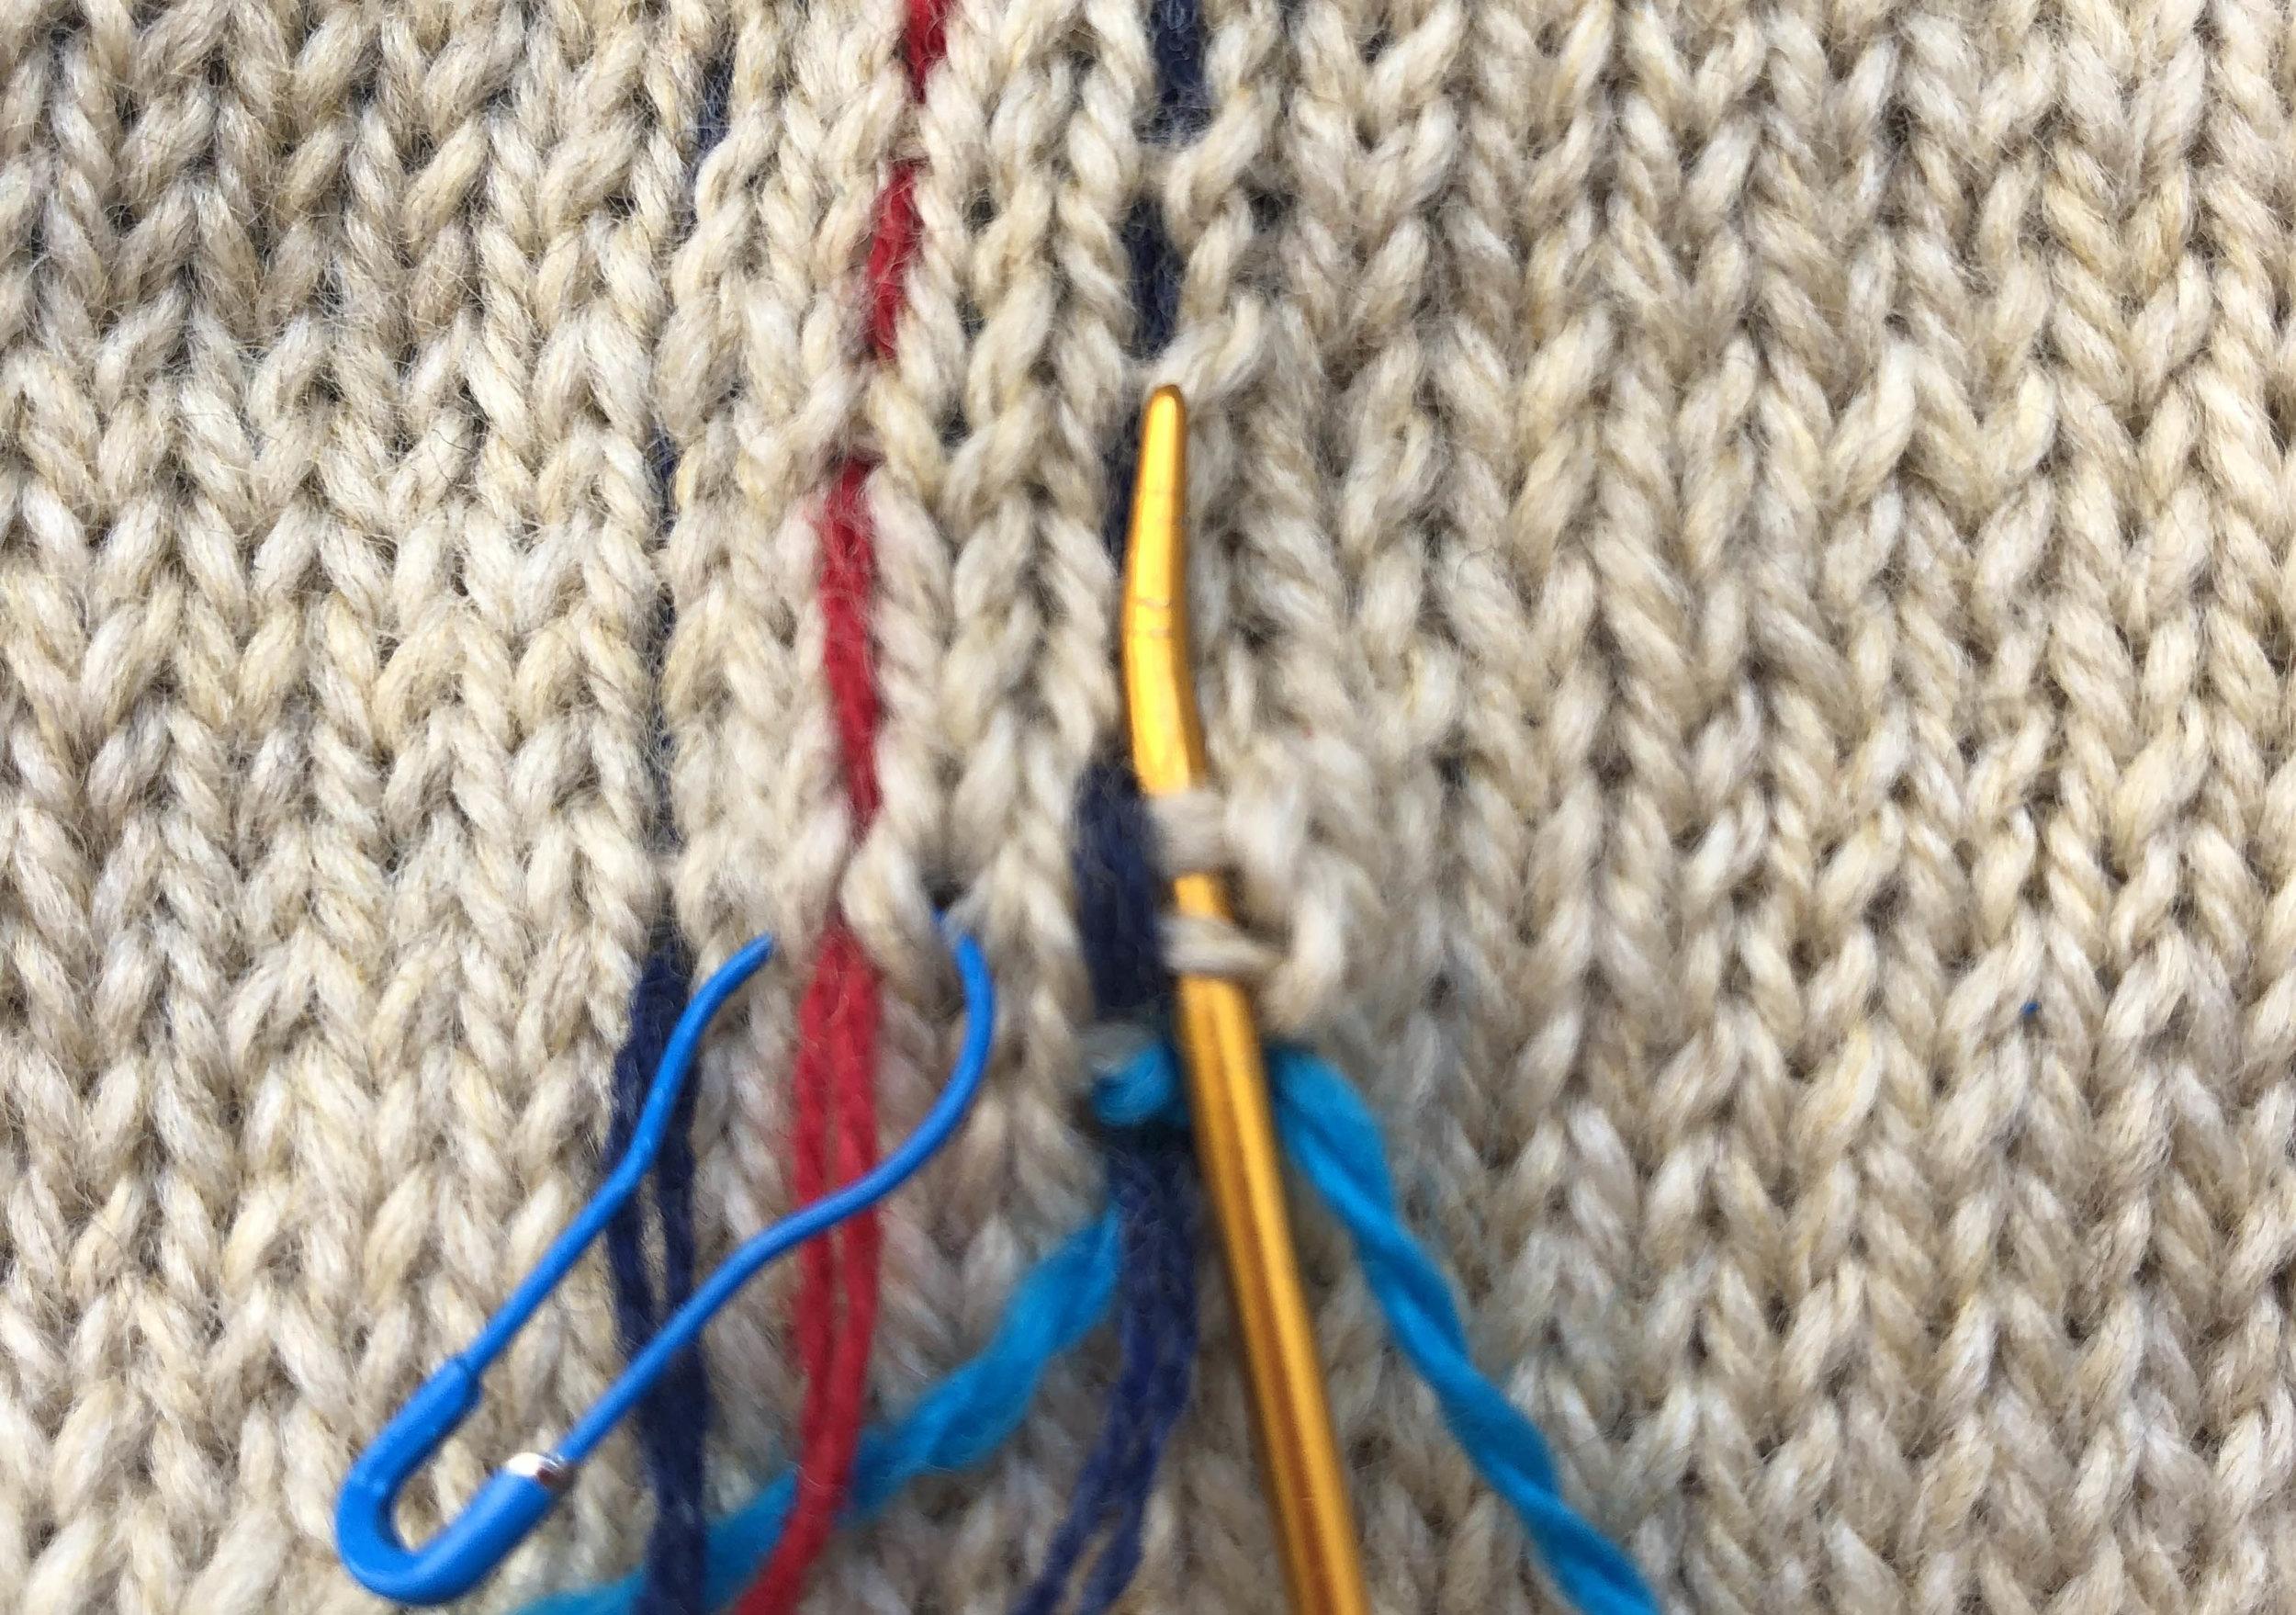 merele back stitch steek 4.jpg